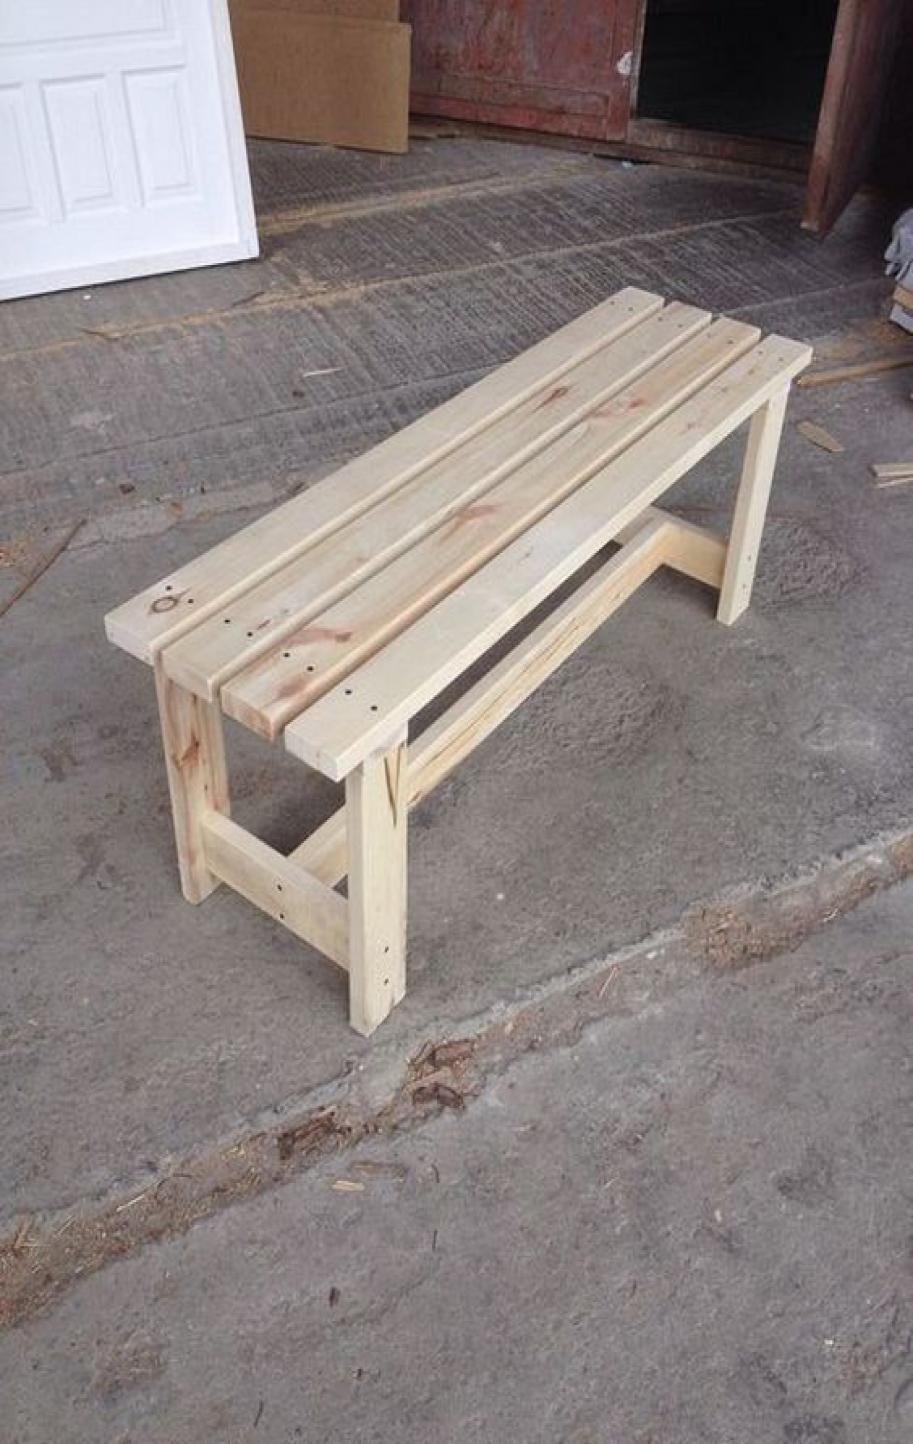 Tflers Designing Decor Zoo Crafty Like Mini Family Holiday Interior123 Electronics Designing In 2020 Diy Bench Outdoor Diy Bench Seat Diy Wood Bench